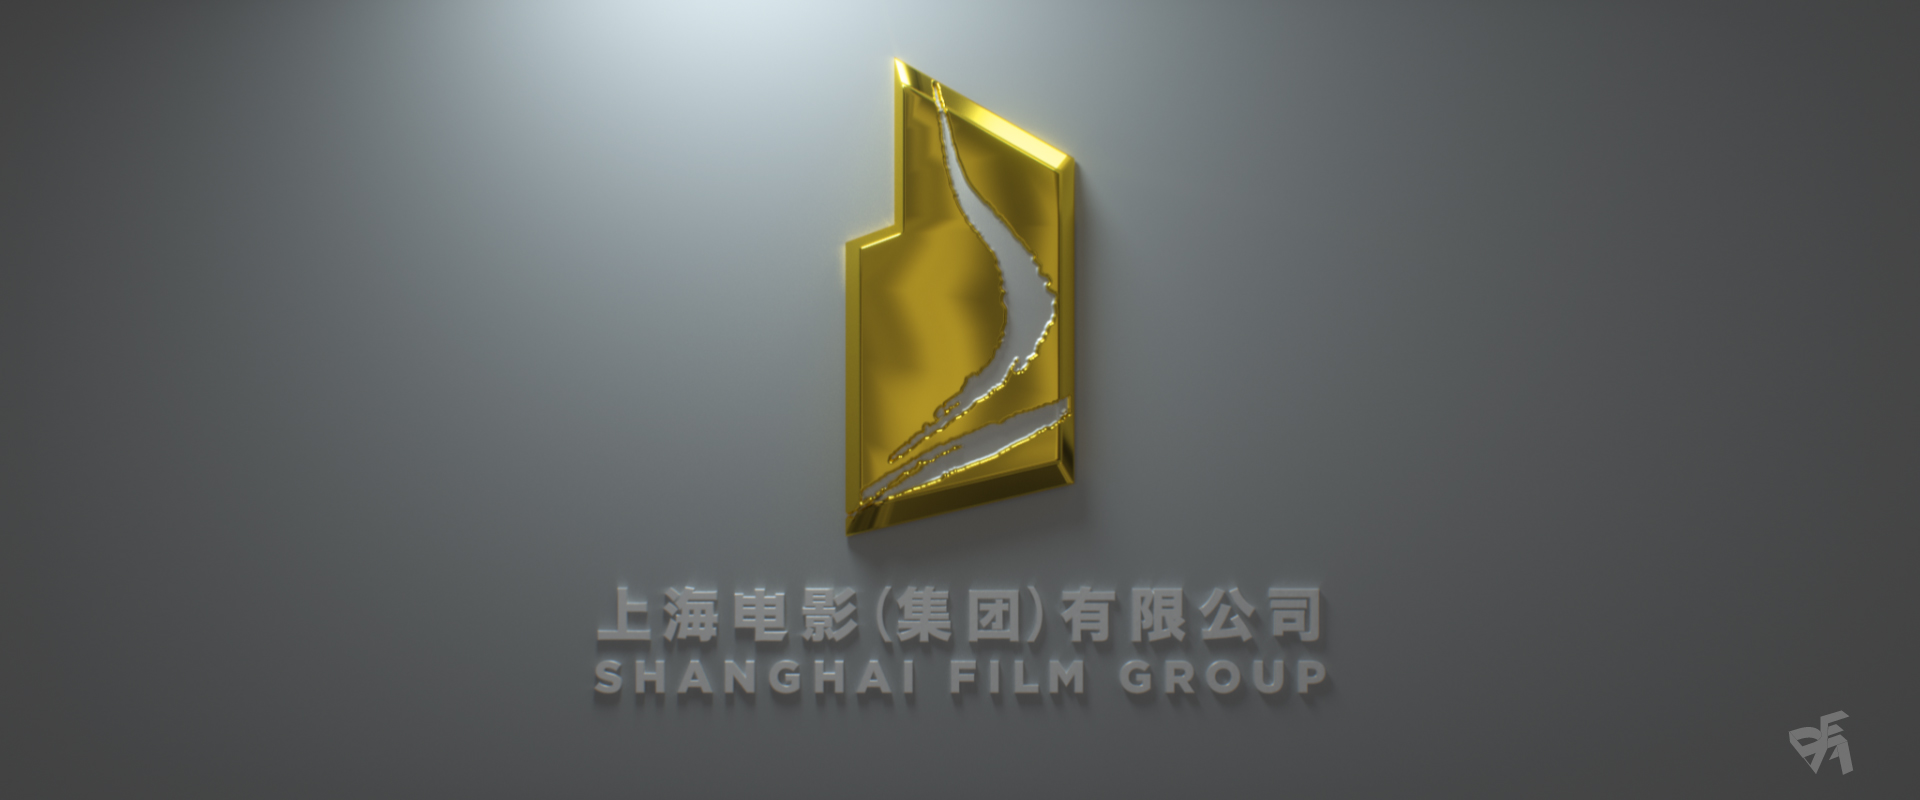 ShanghaiFilmGroup_STYLEFRAME_02.jpg